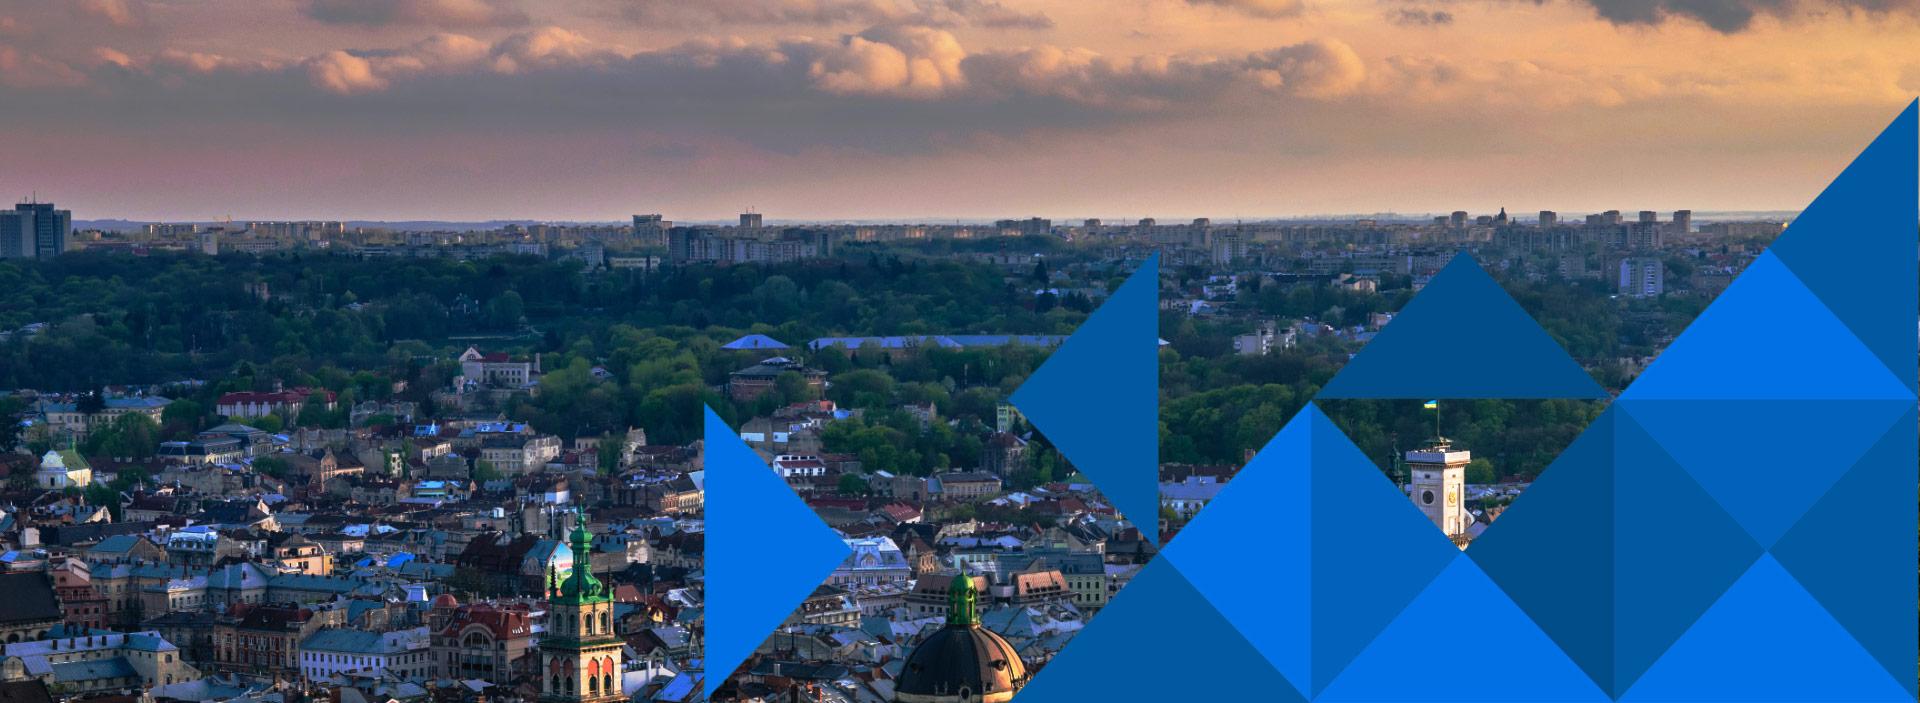 Lviv Development Companies Empowering Local Tech Cluster